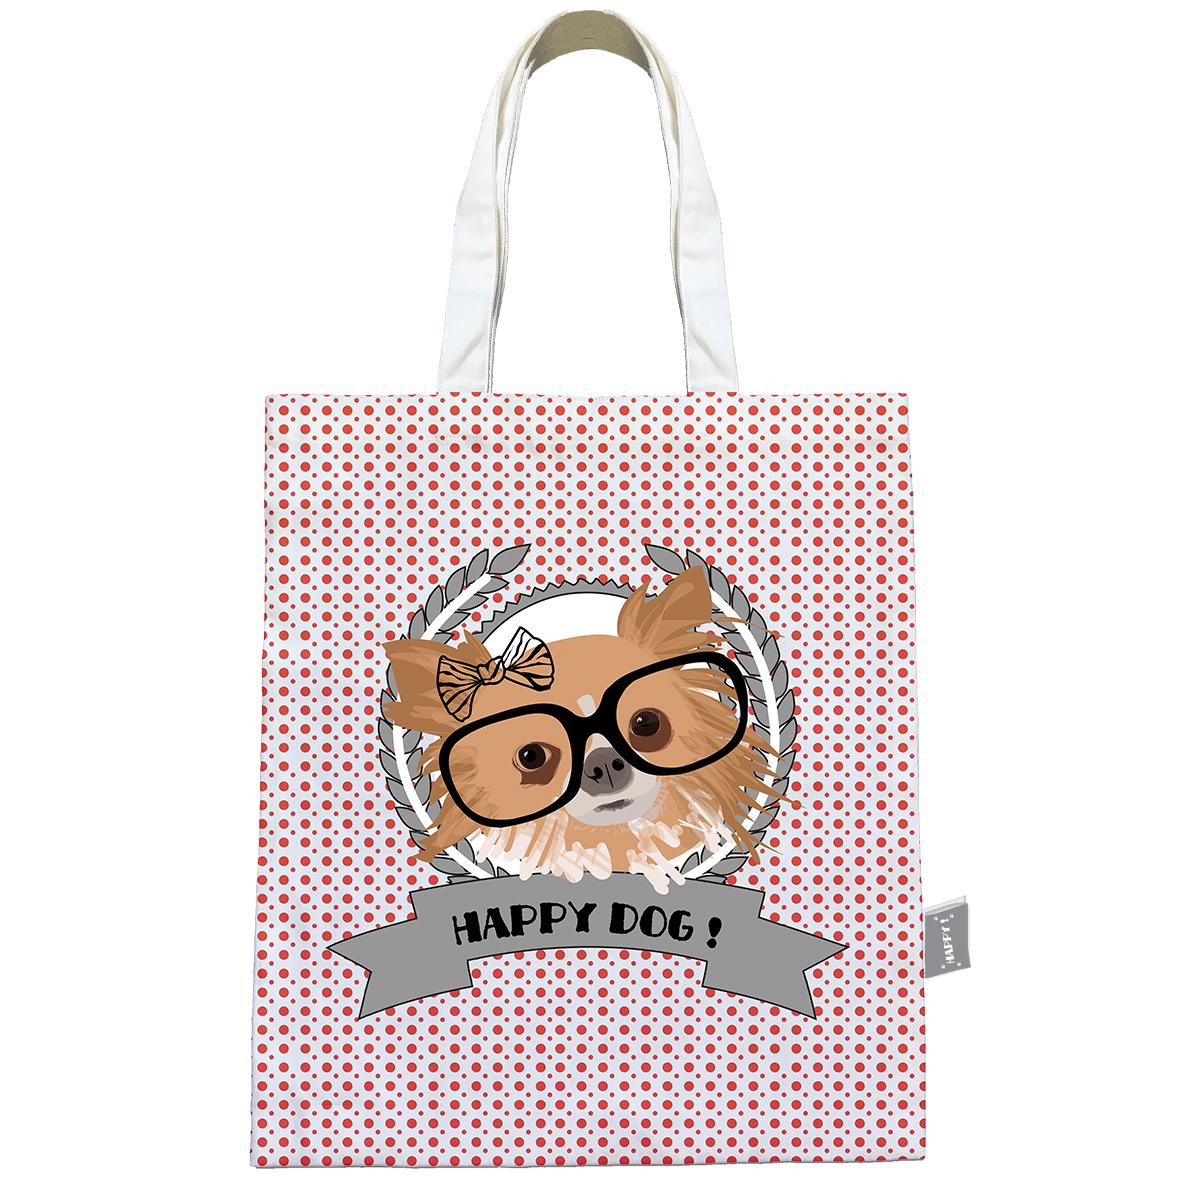 Sac coton / tote bag \'Happy Dog\' (lunettes) - 44x38 cm - [Q0595]